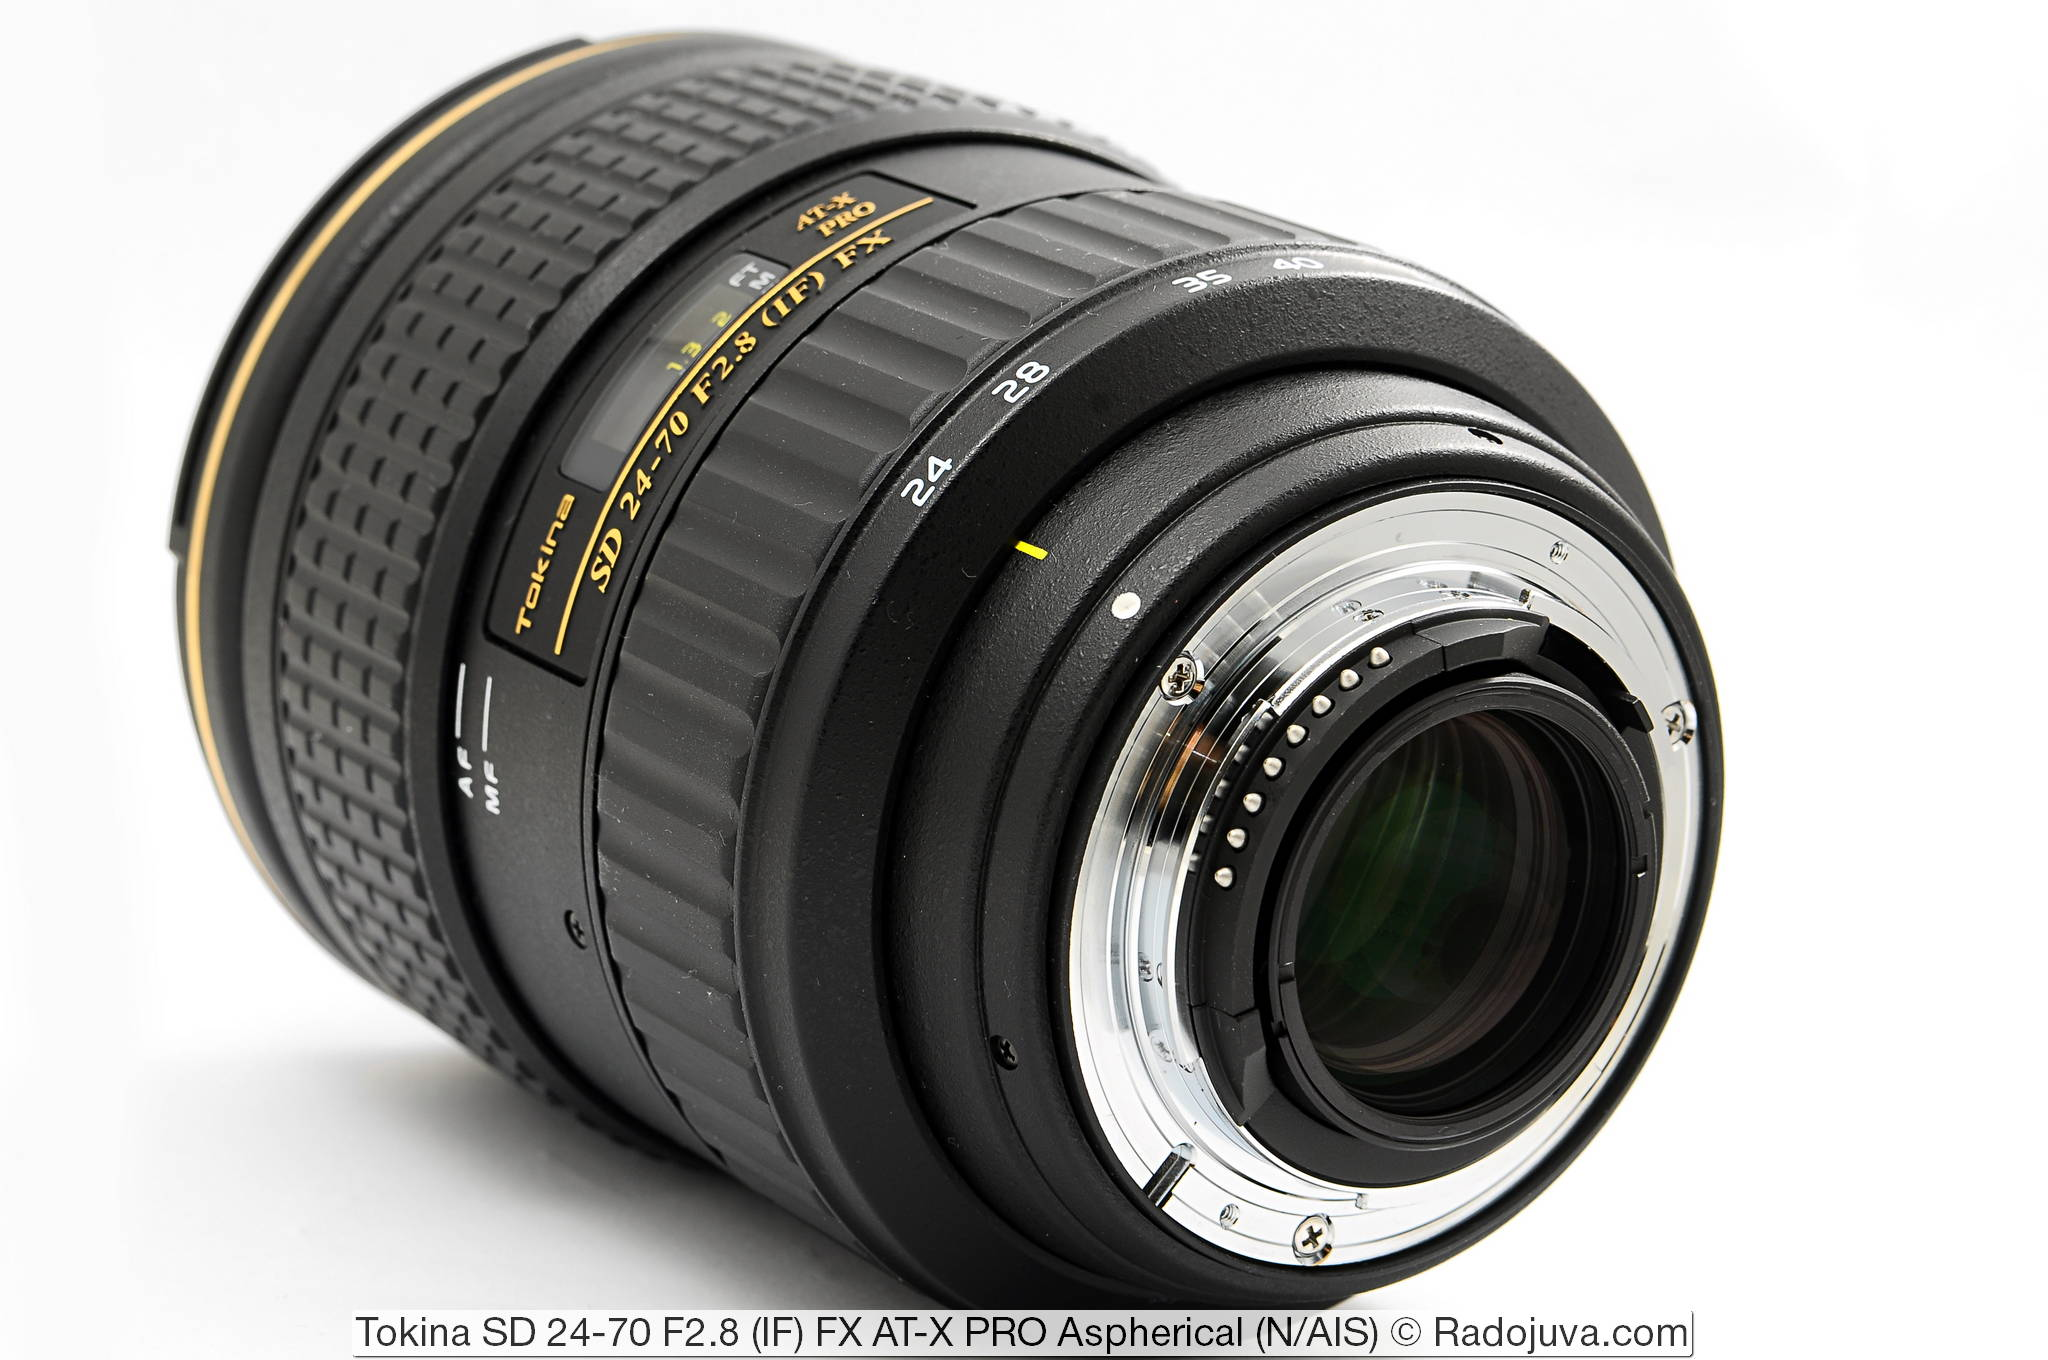 Tokina SD 24-70 F2.8 (IF) FX AT-X PRO Aspherical